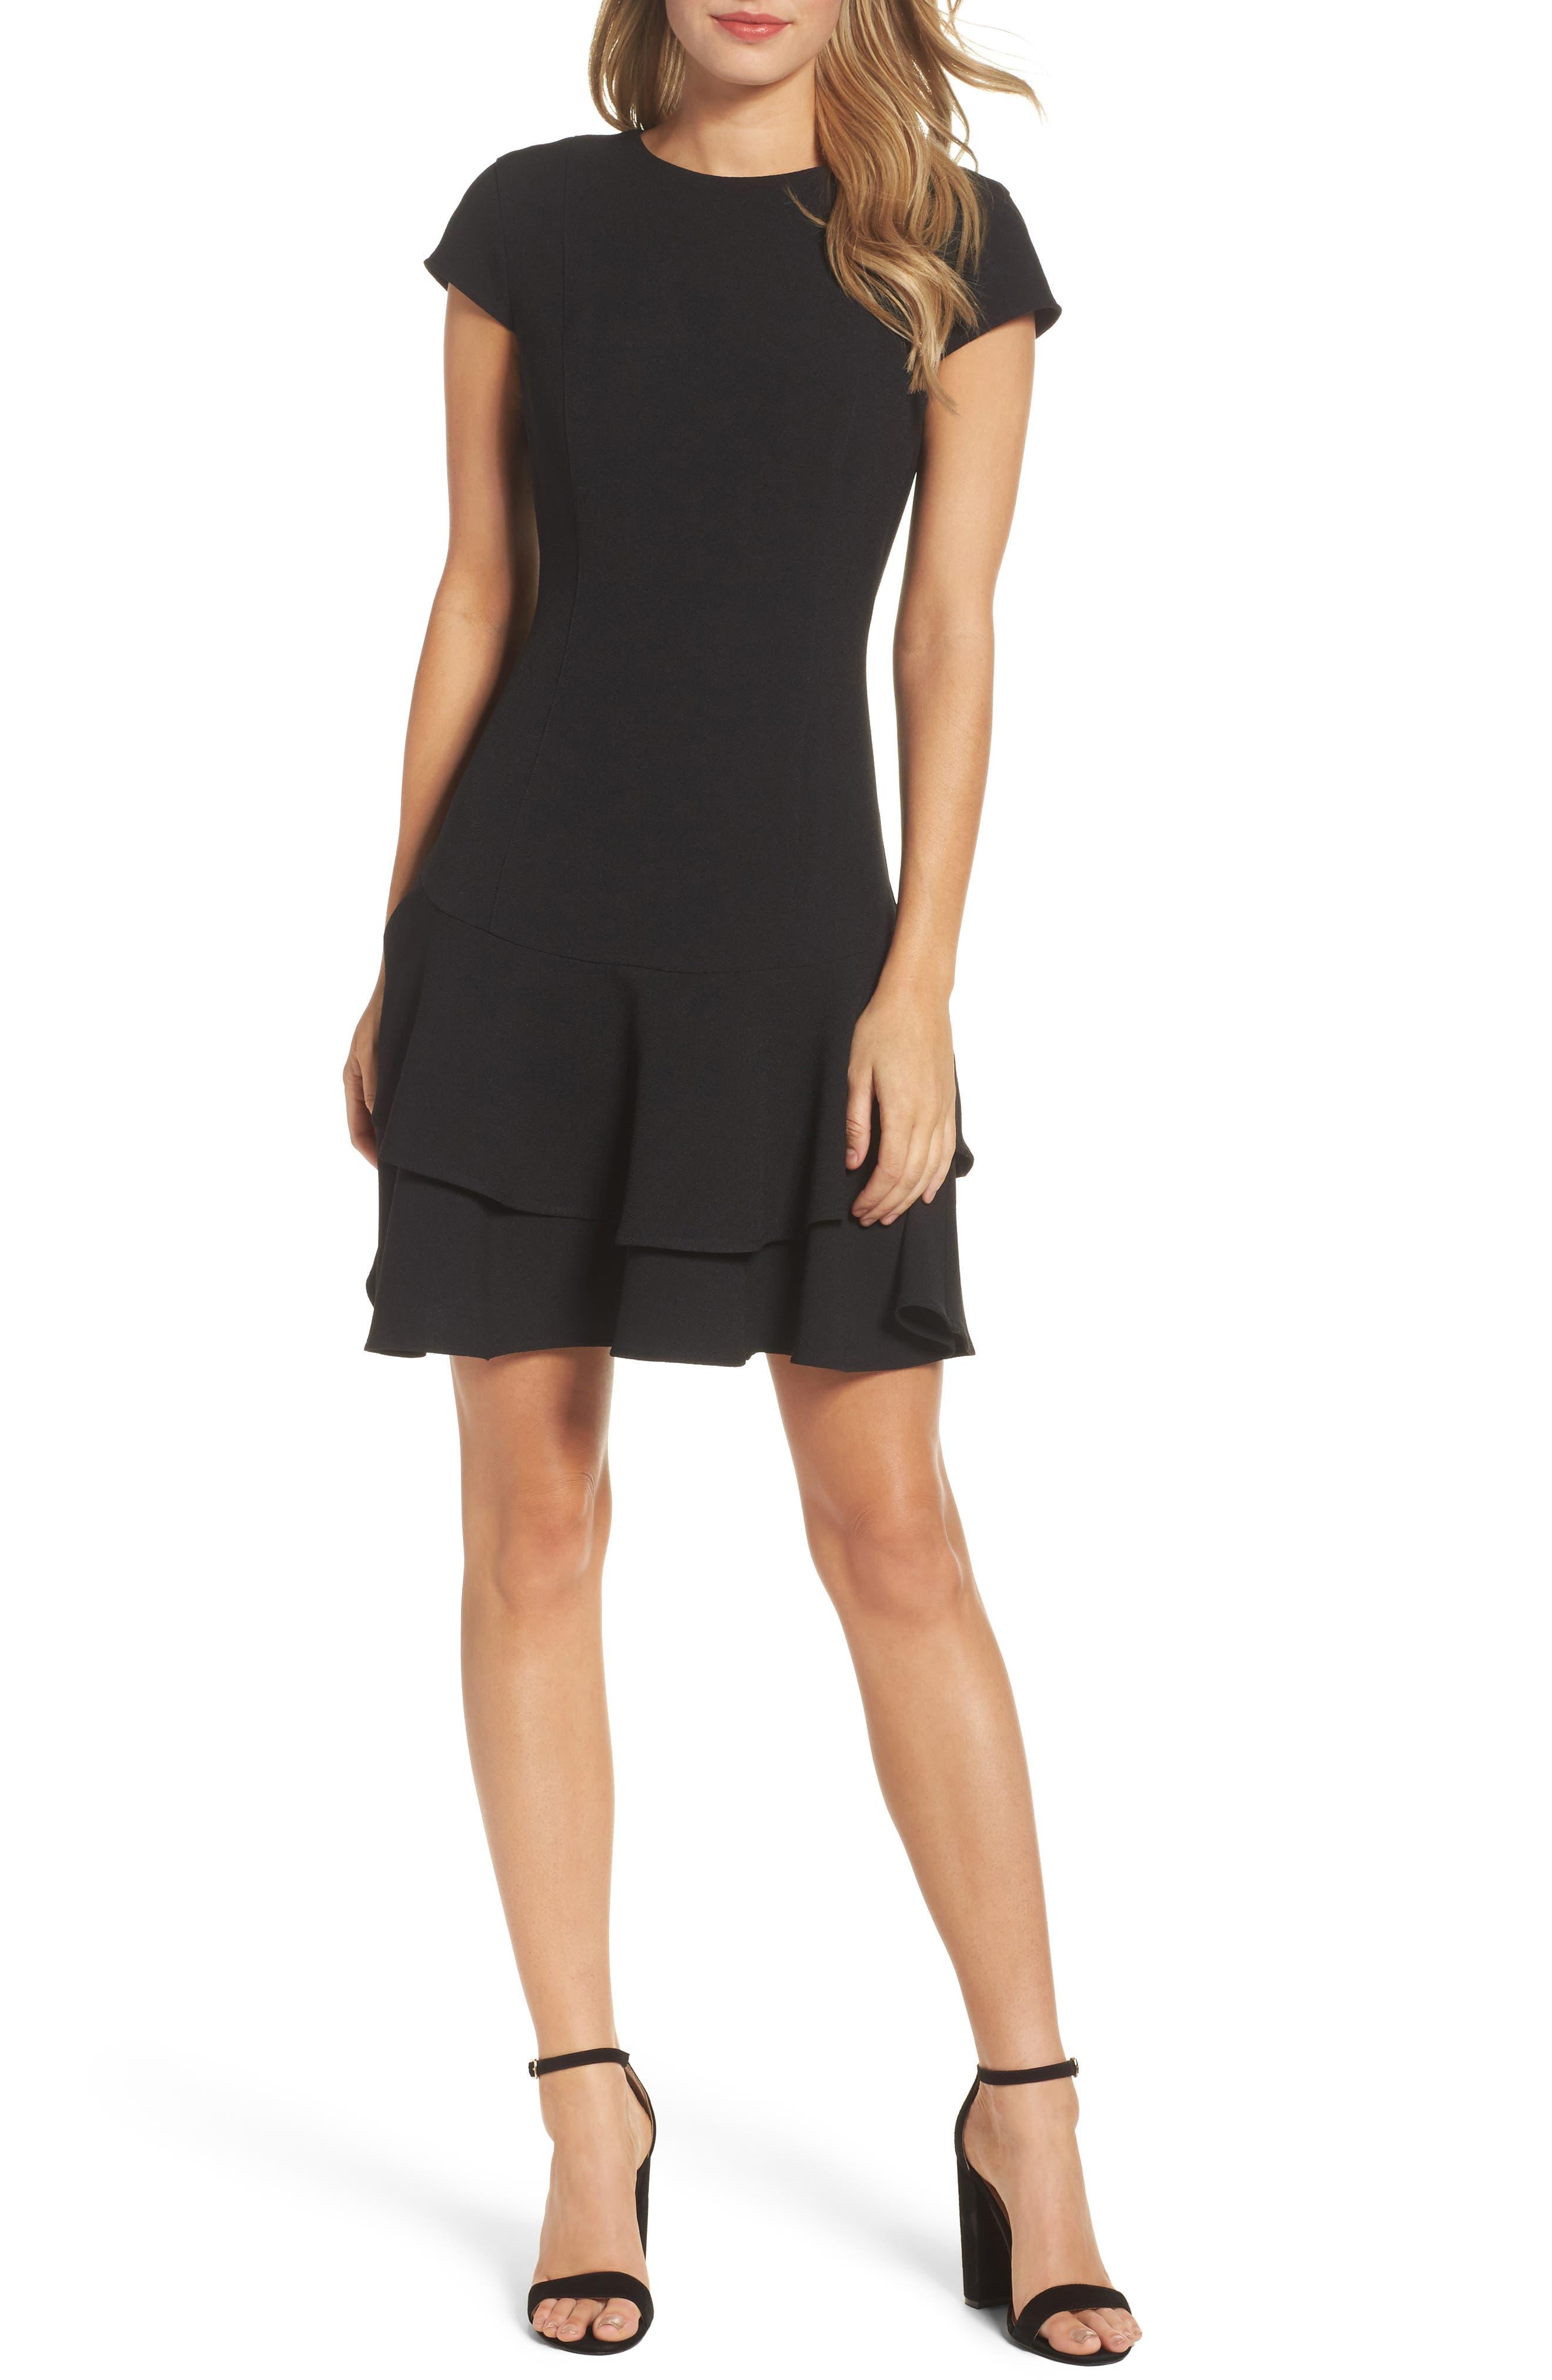 Short Little Black Dresses with Sleeves